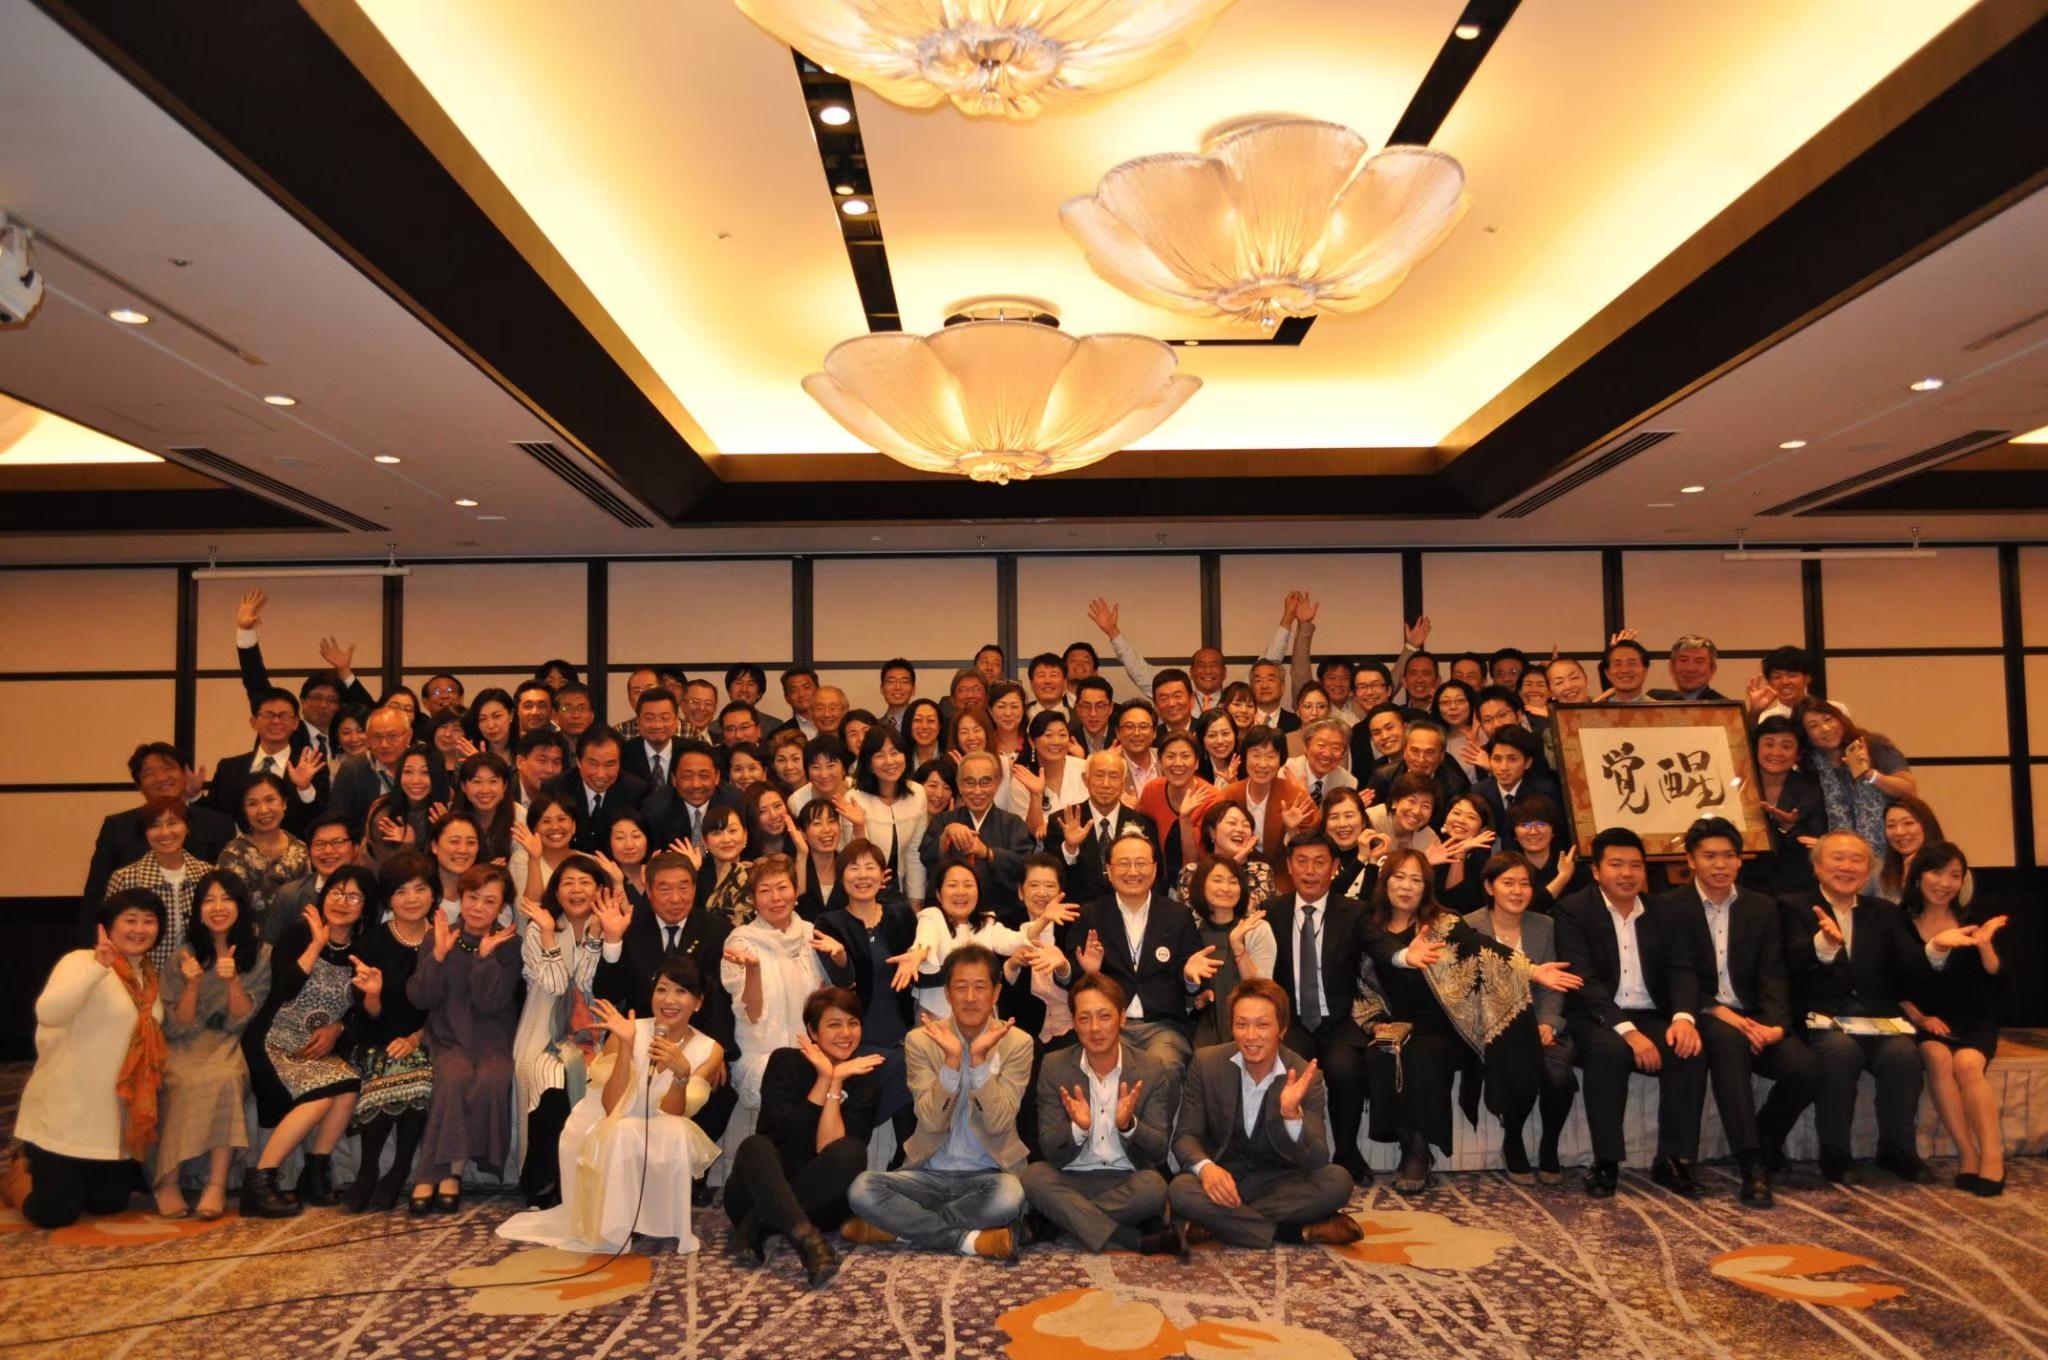 shifukaizenkoku 210602 15 - 思風会 ZOOM全国大会